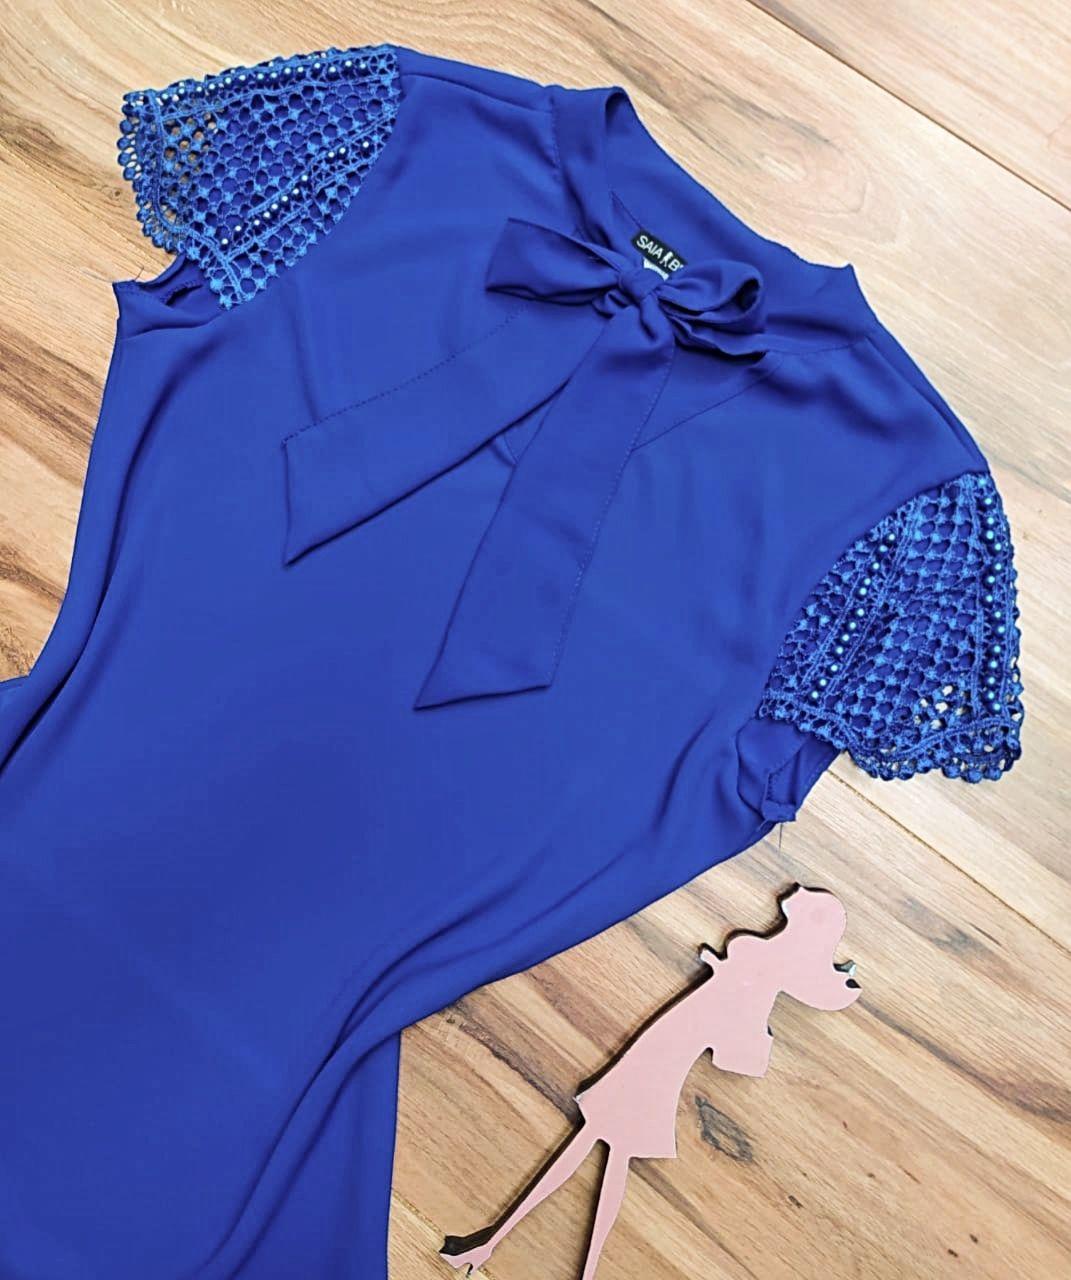 Blusa Heloísa Saia Bella - SBR7780 Azul Royal